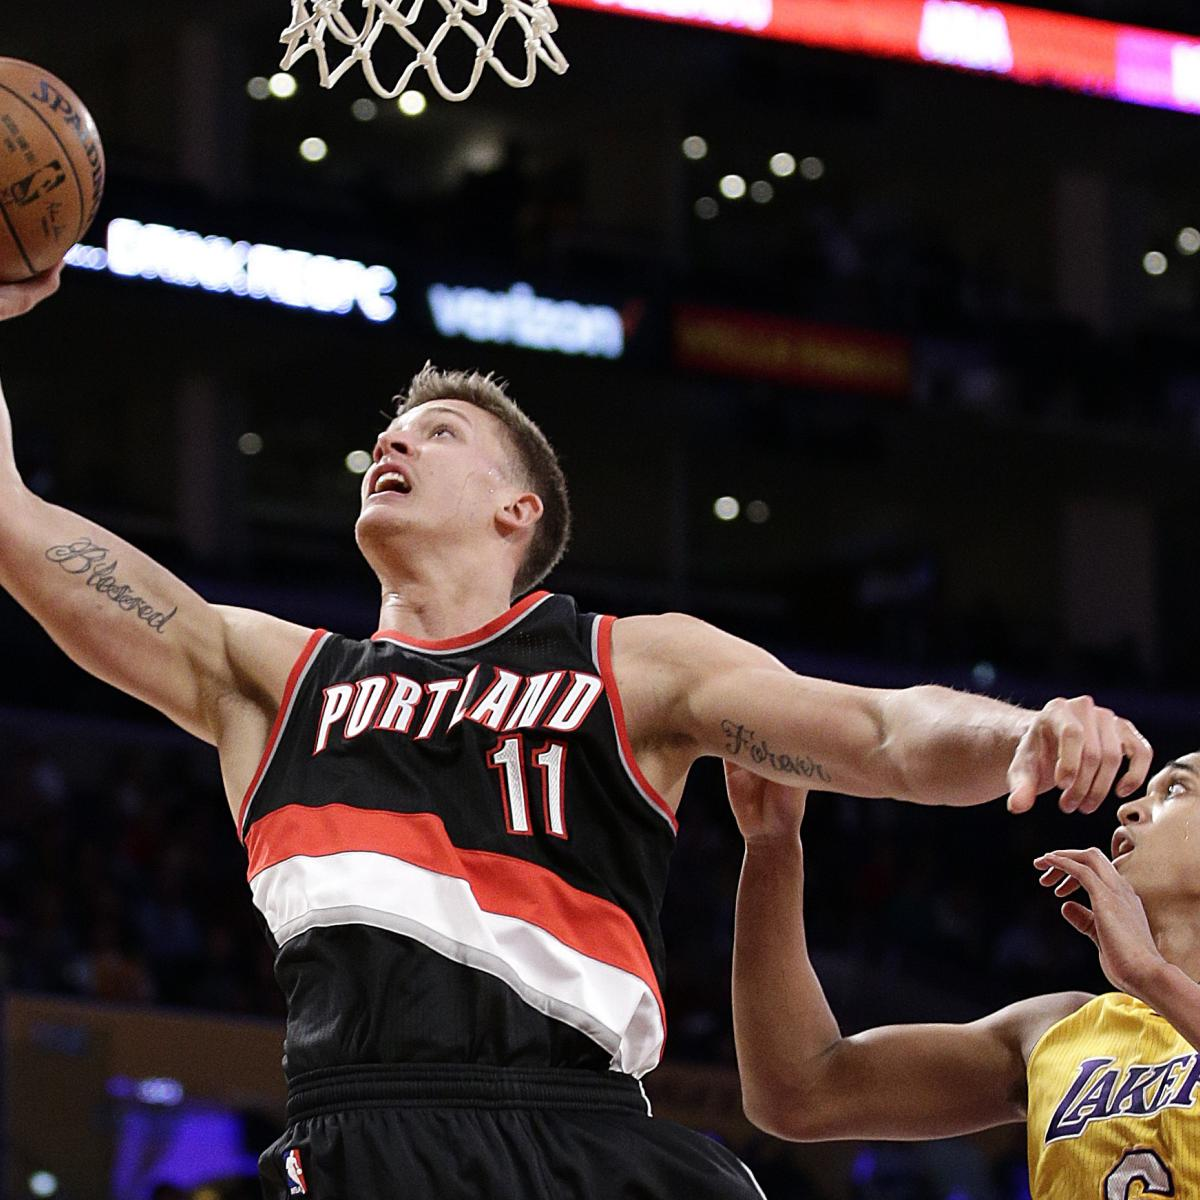 Portland Trail Blazers Injury News: Meyers Leonard Injury: Updates On Trail Blazers PF's